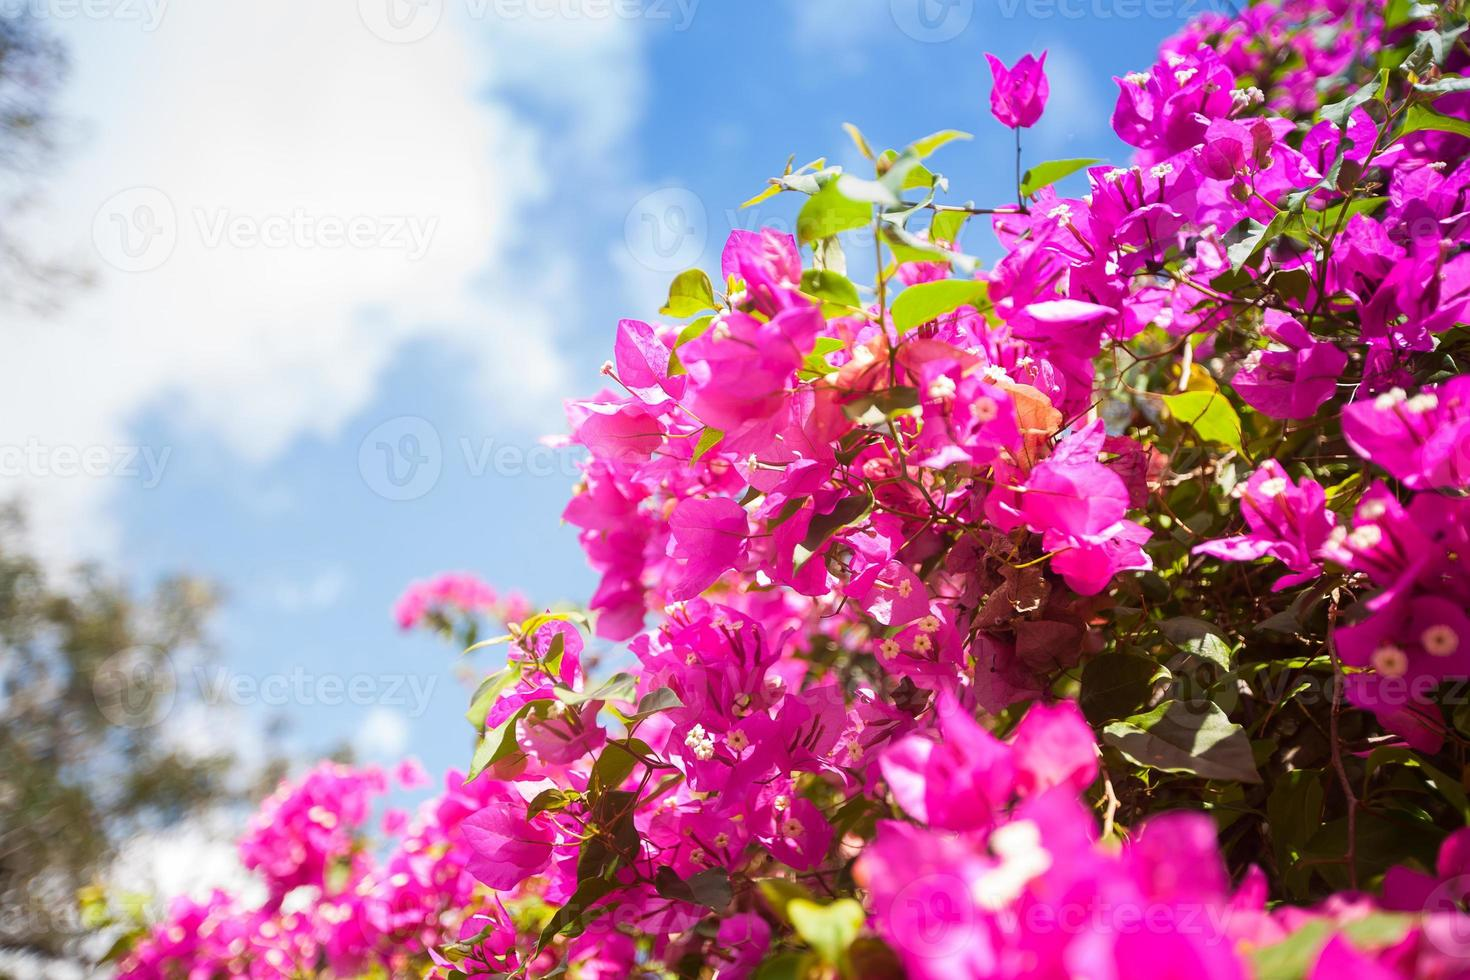 blühende rosa Blumen gegen blauen Himmel foto